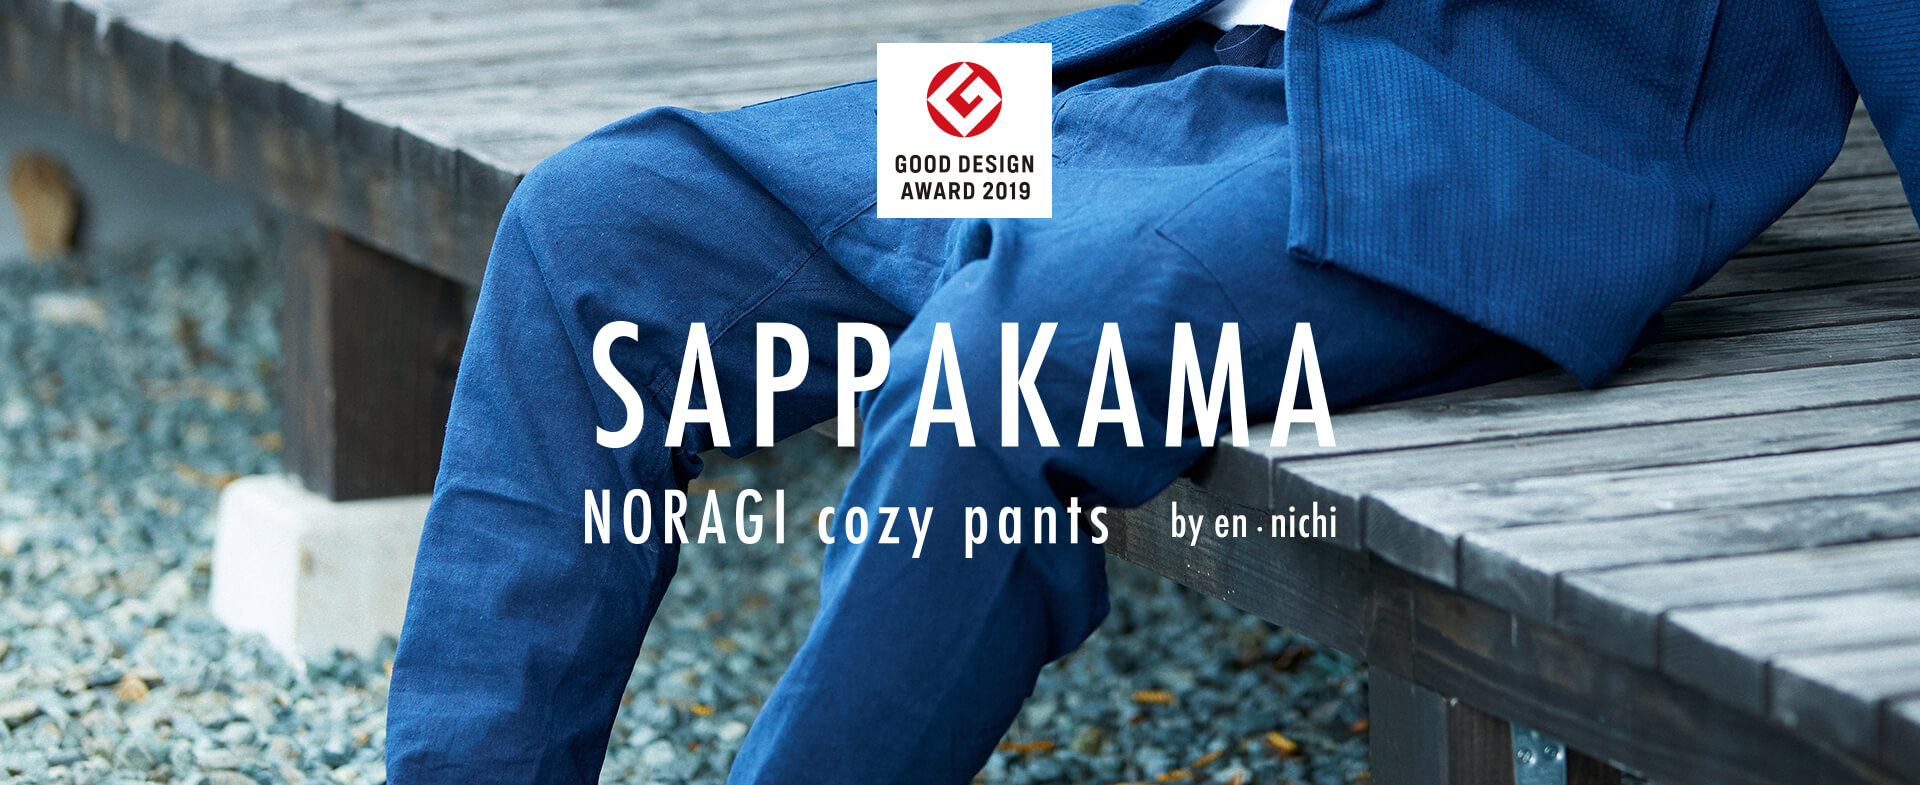 en・nichi(エンニチ) 2019年度グッドデザイン賞 受賞 SAPPAKAMA